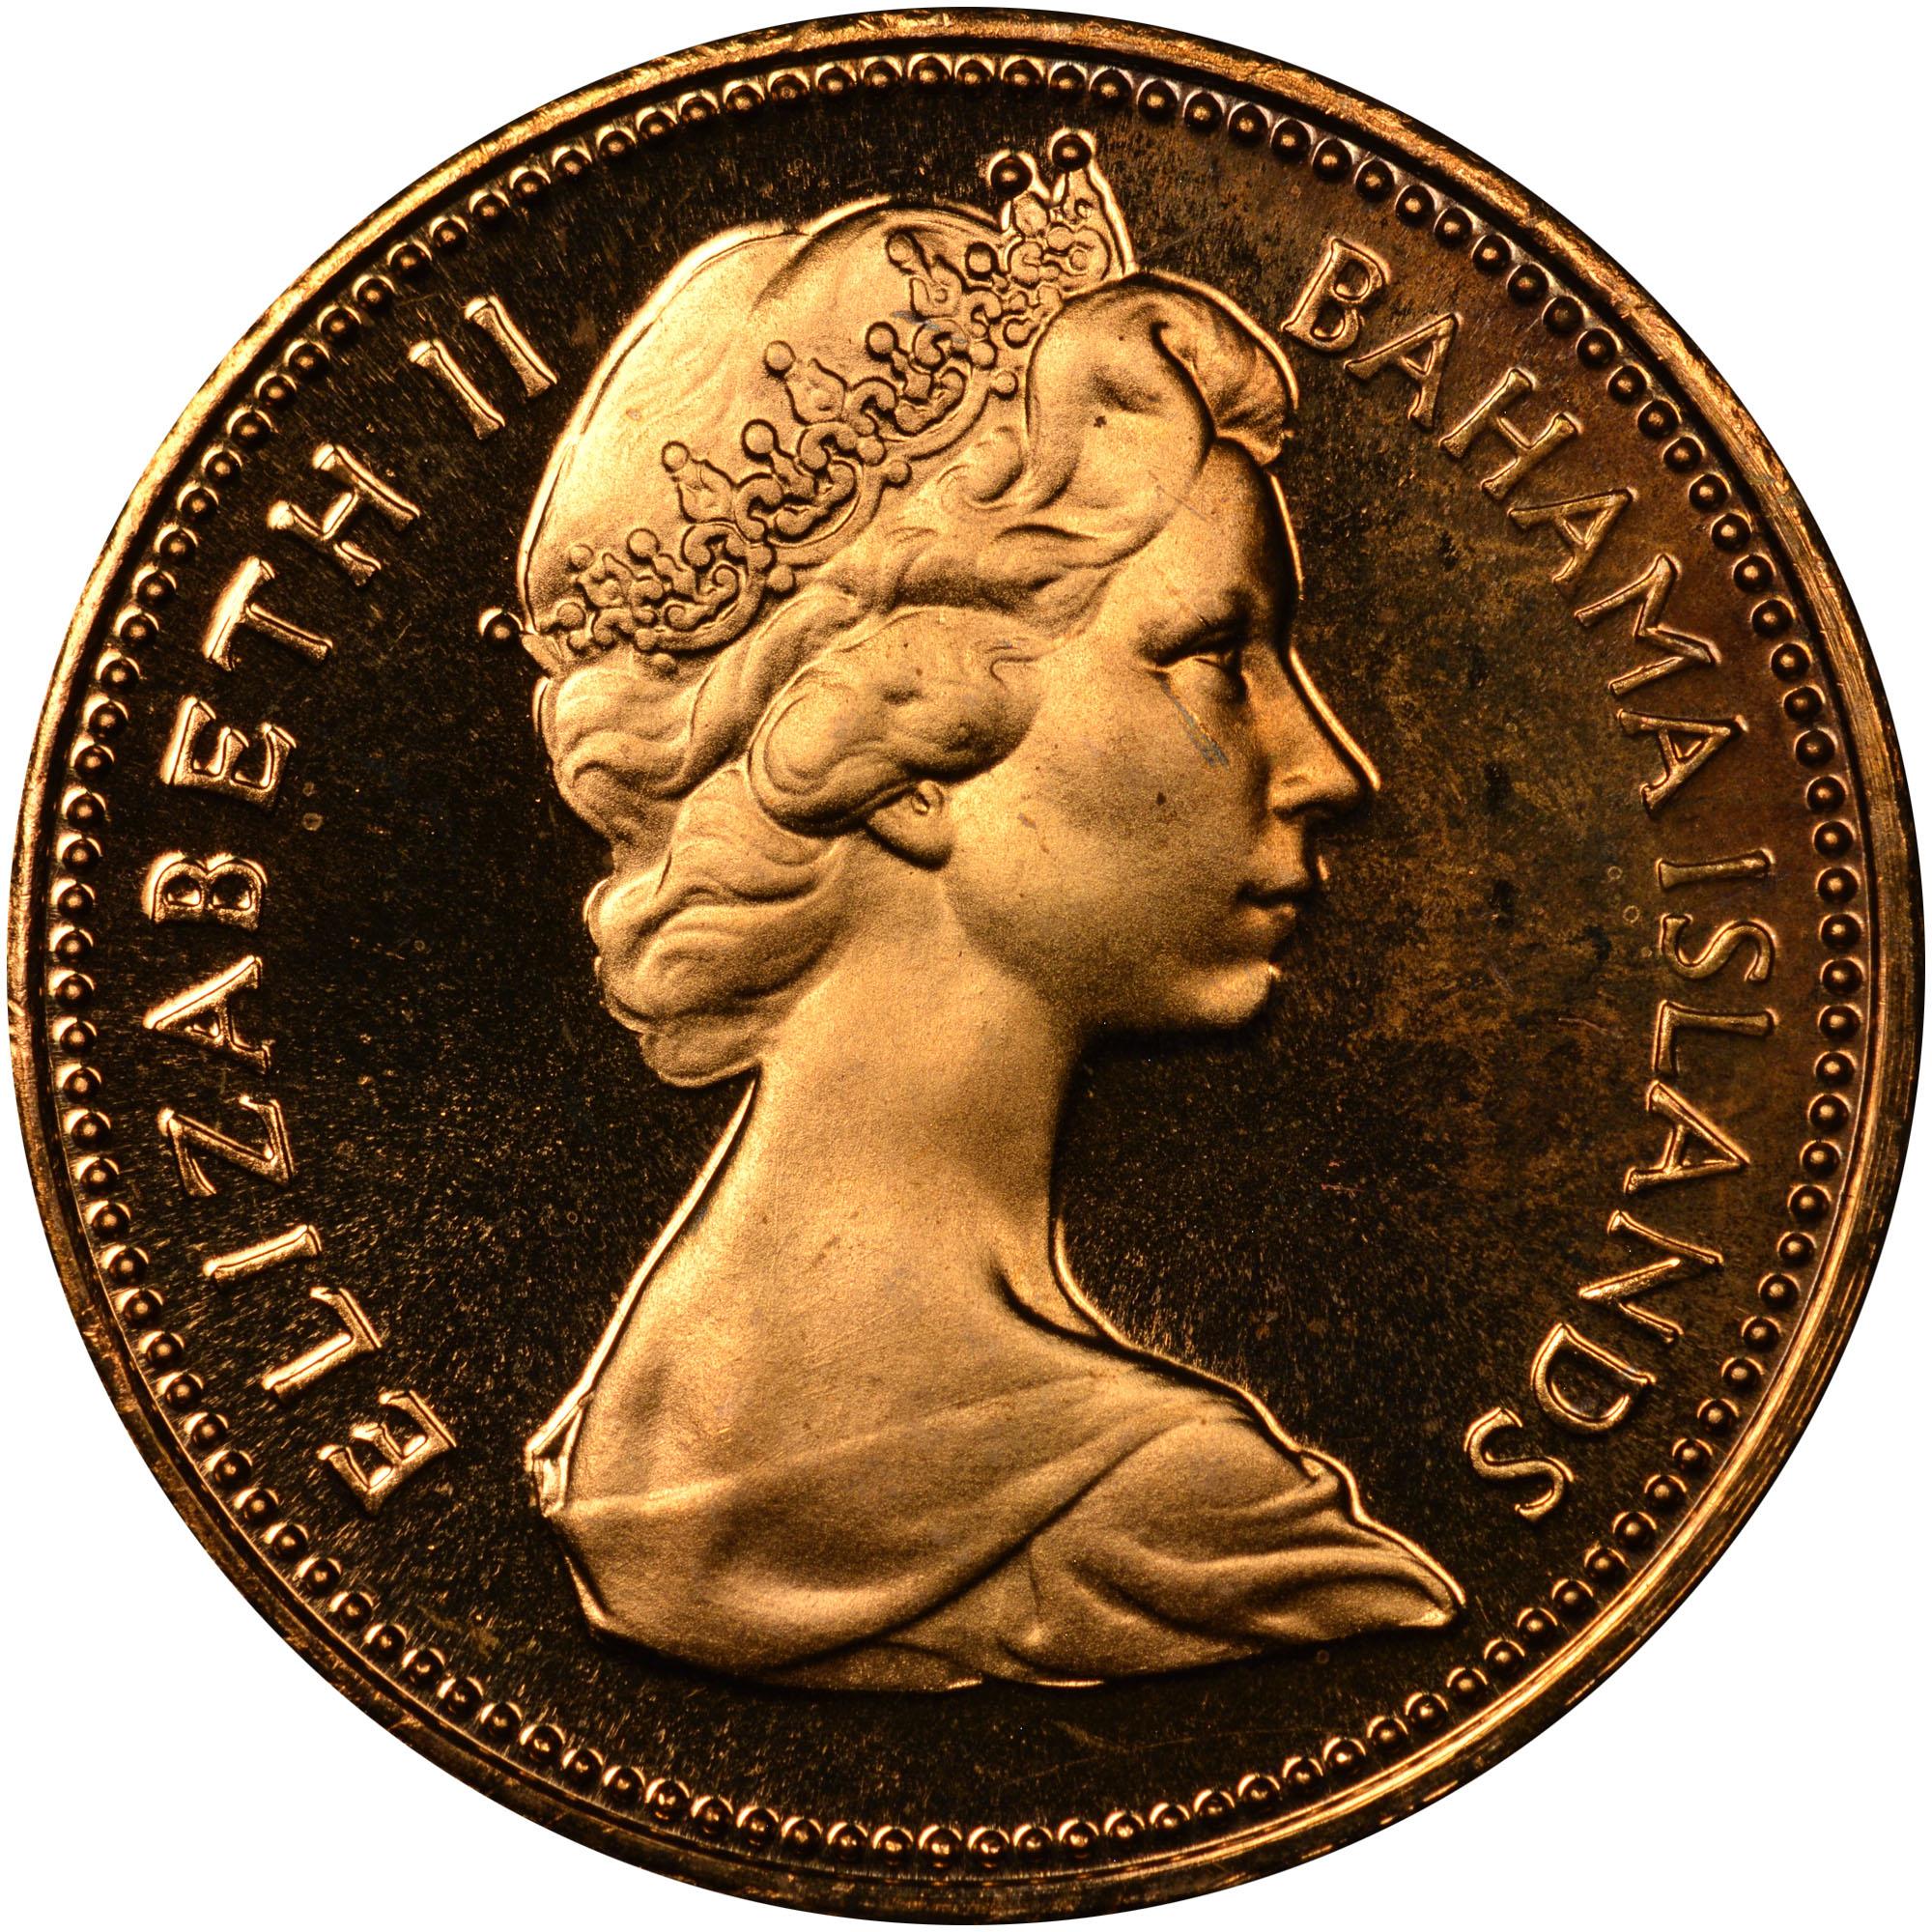 1970 Bahamas Cent obverse